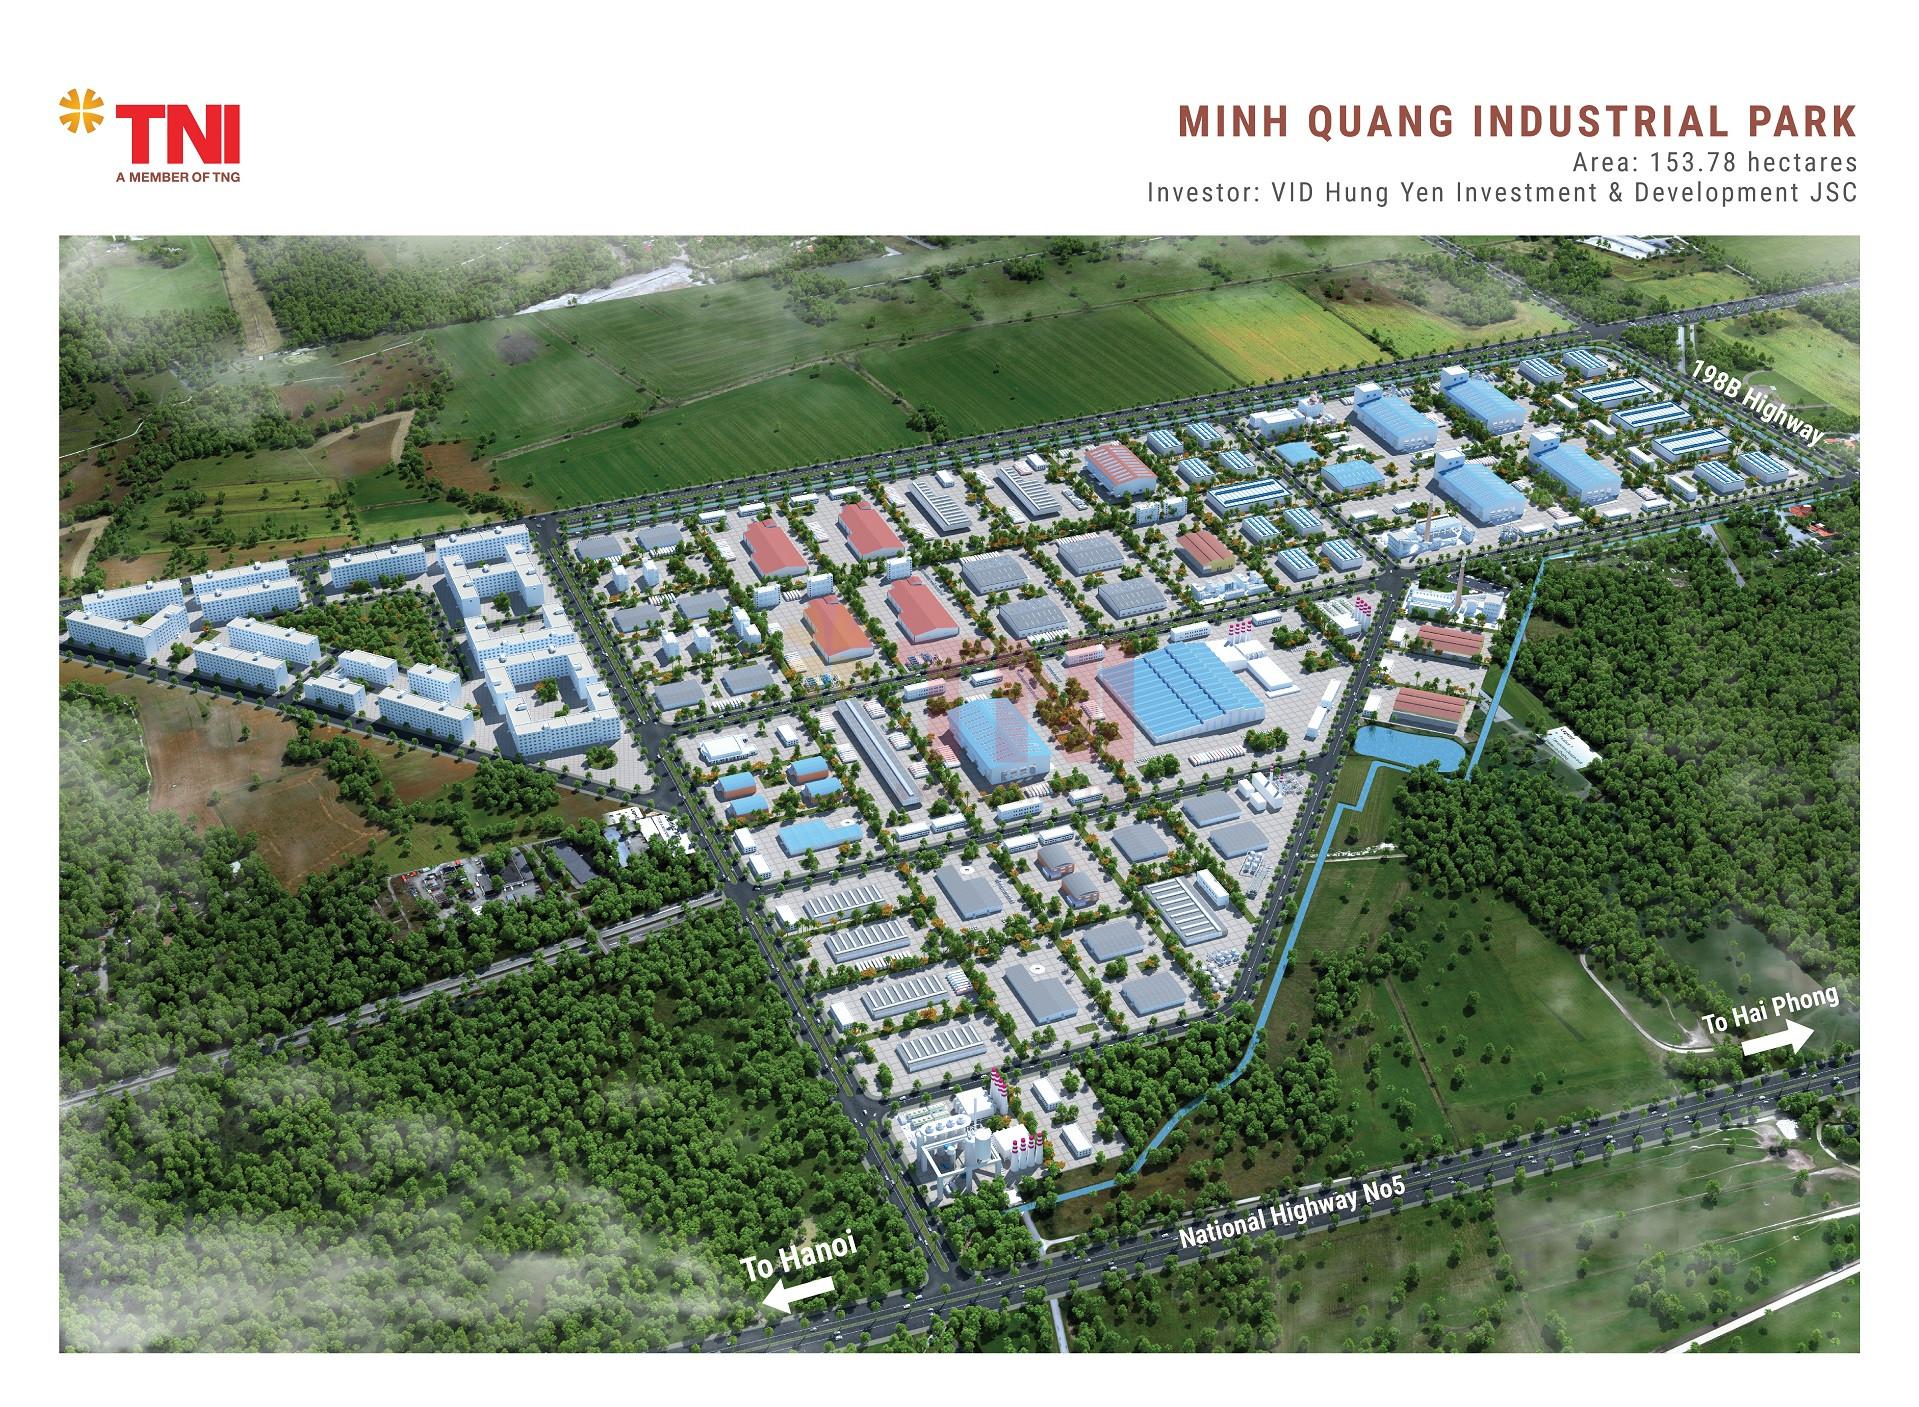 Minh Quang Industrial Park – Hung Yen Province